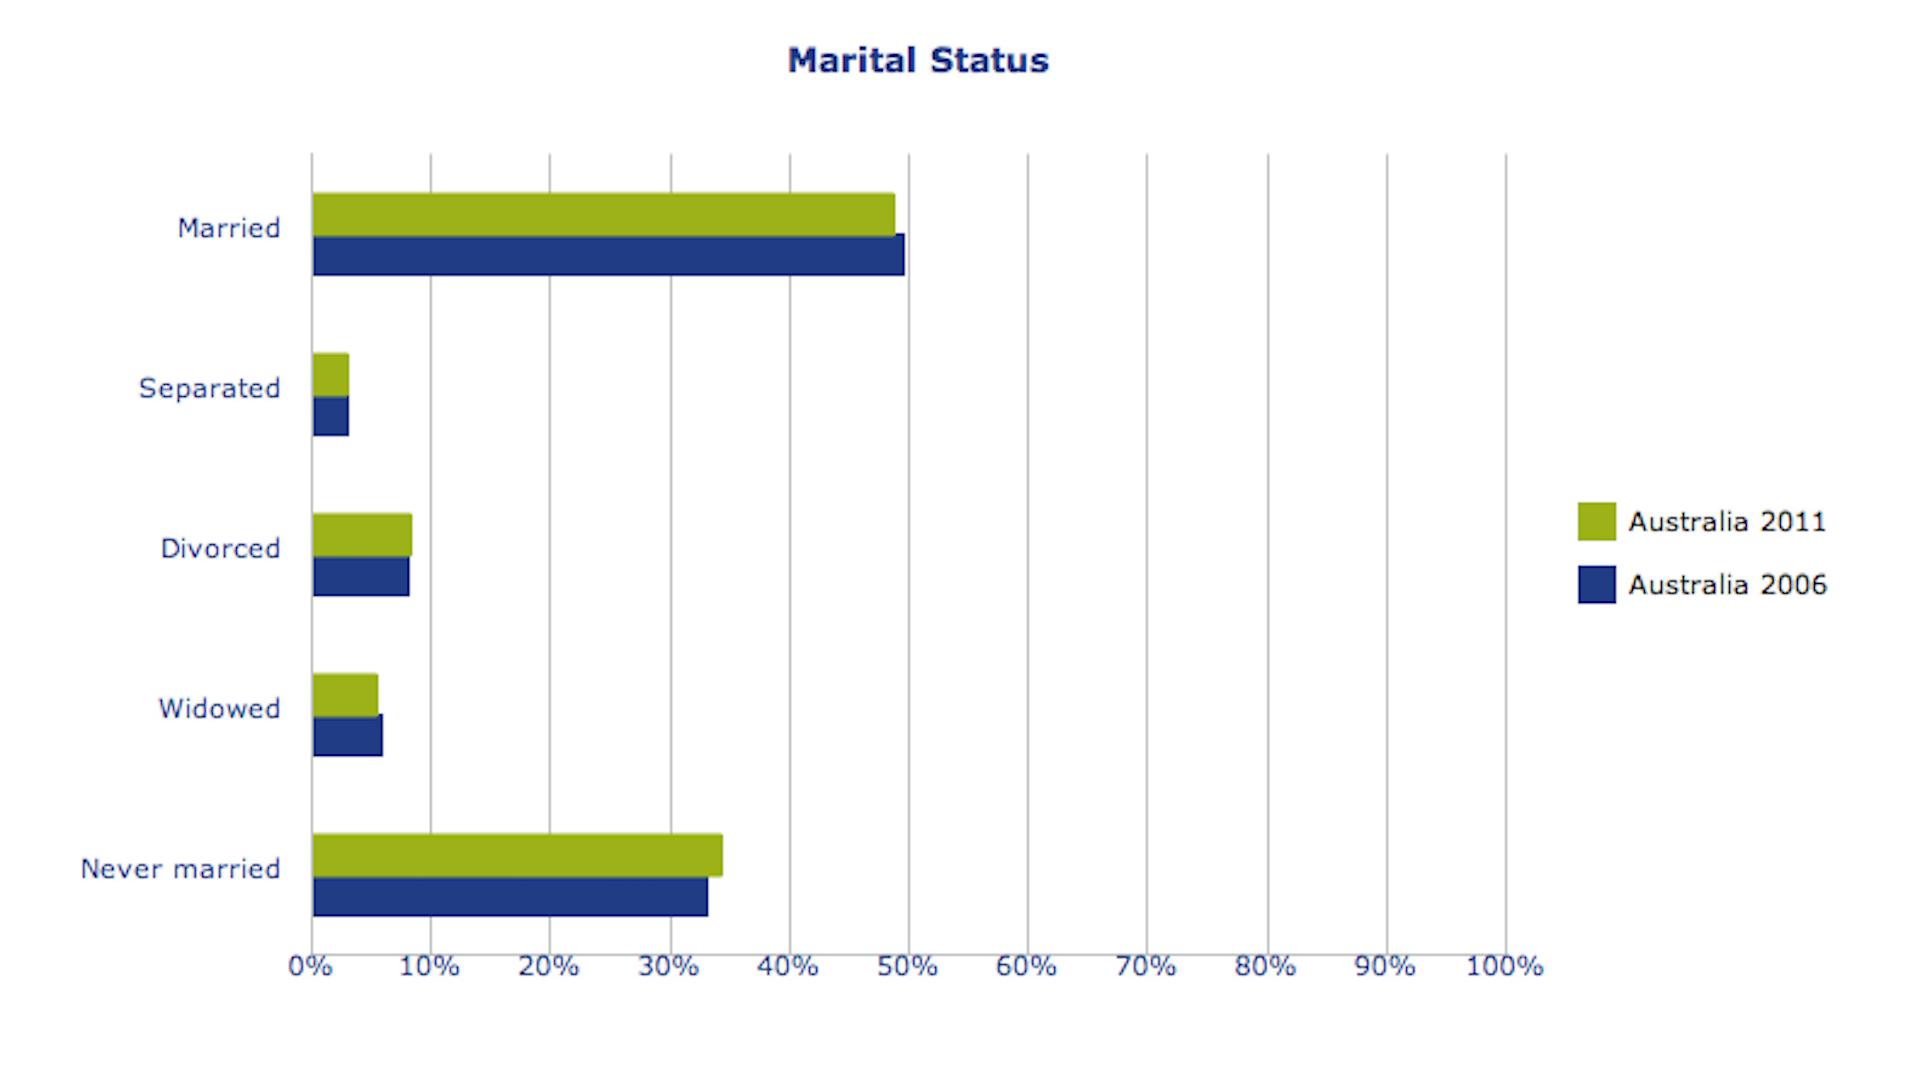 Percentage of singles in australia